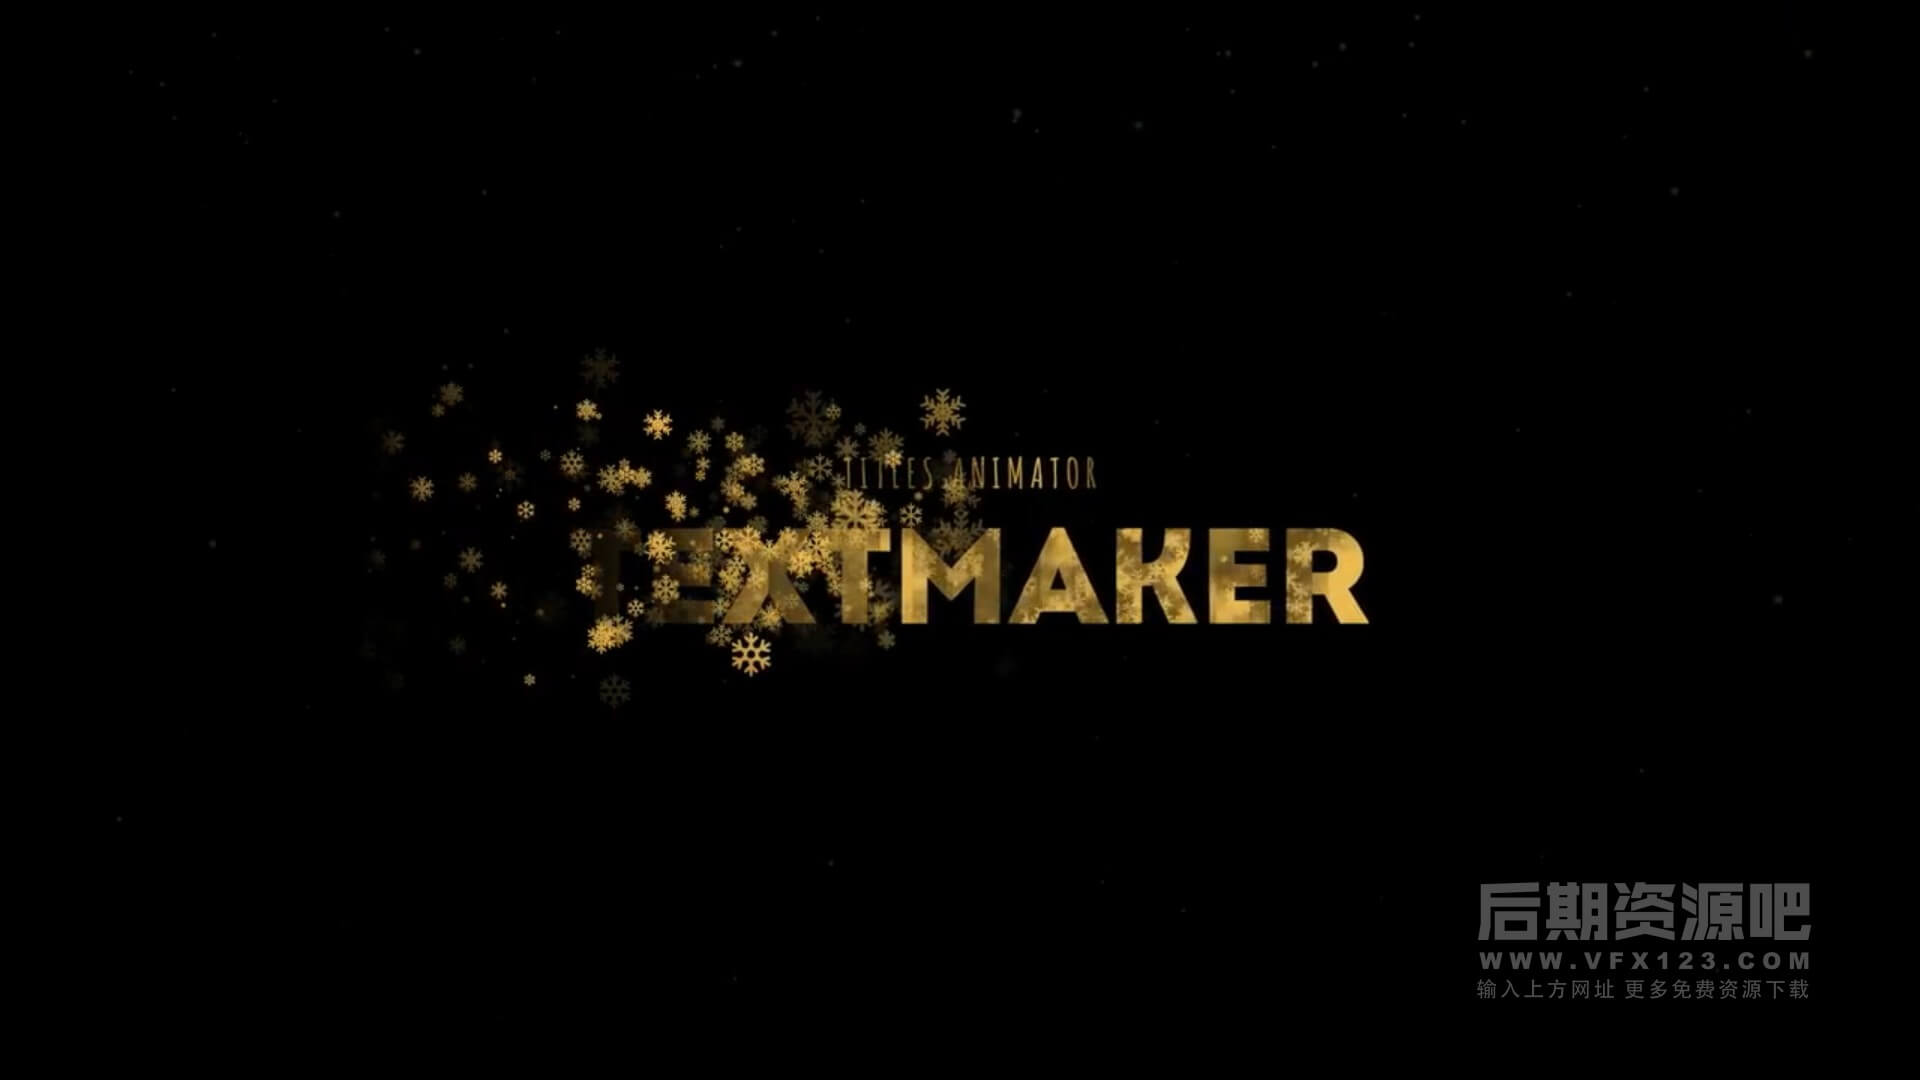 fcpx标题插件 金色银色雪花片飞散文字动画效果模板 Gold Silver Snowflake